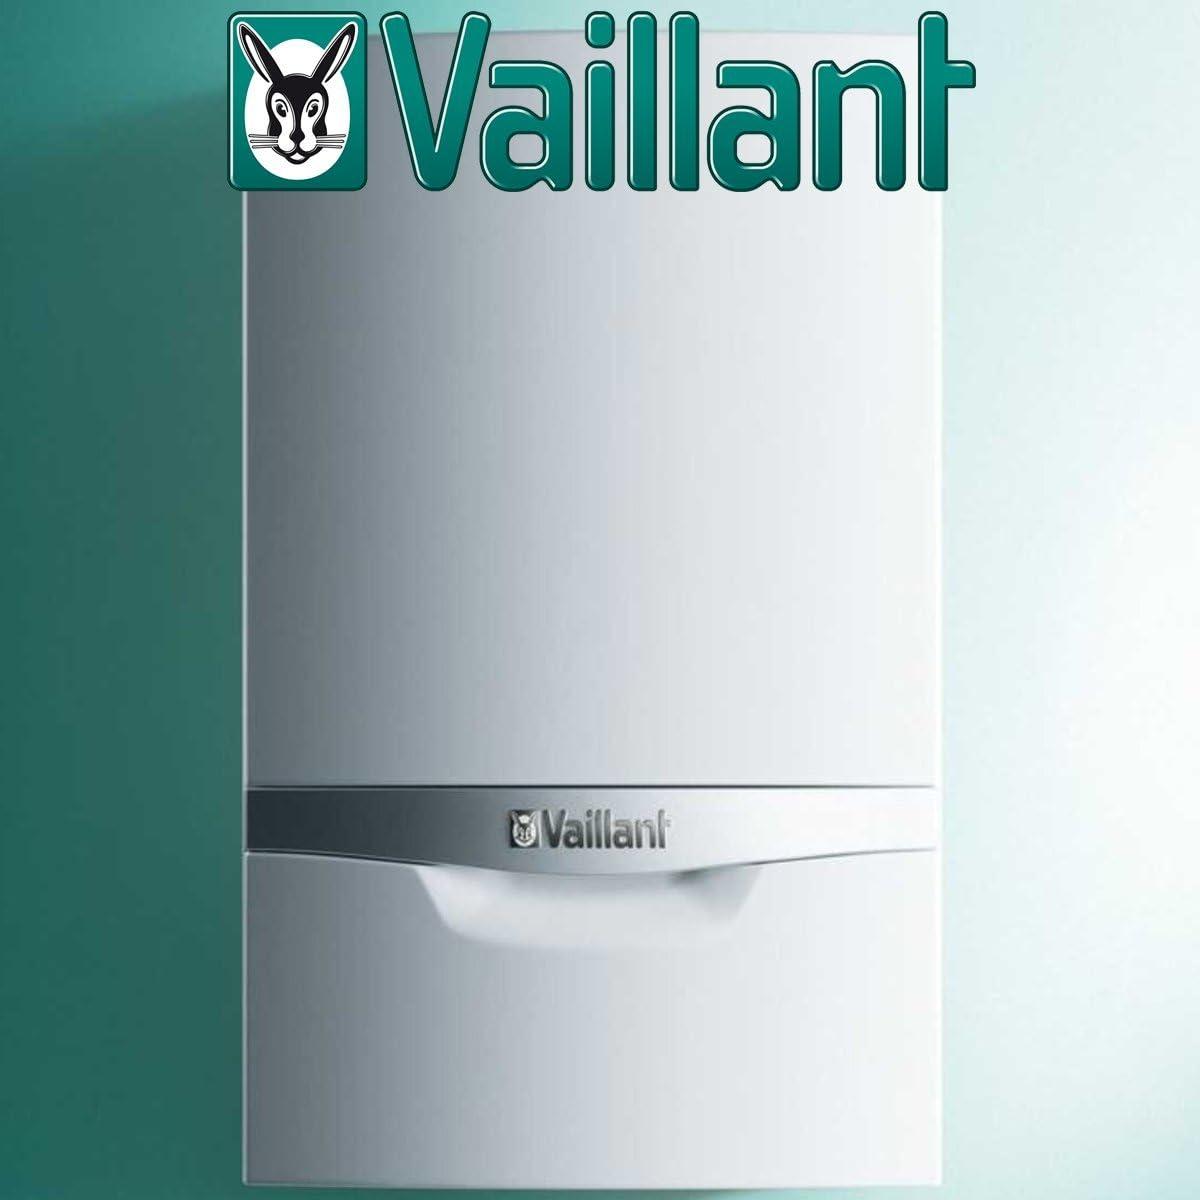 Vaillant 0010021990 Ecotec Pro - Calderas de pared de condensación (VMW 256/5-5 H+ MTN)